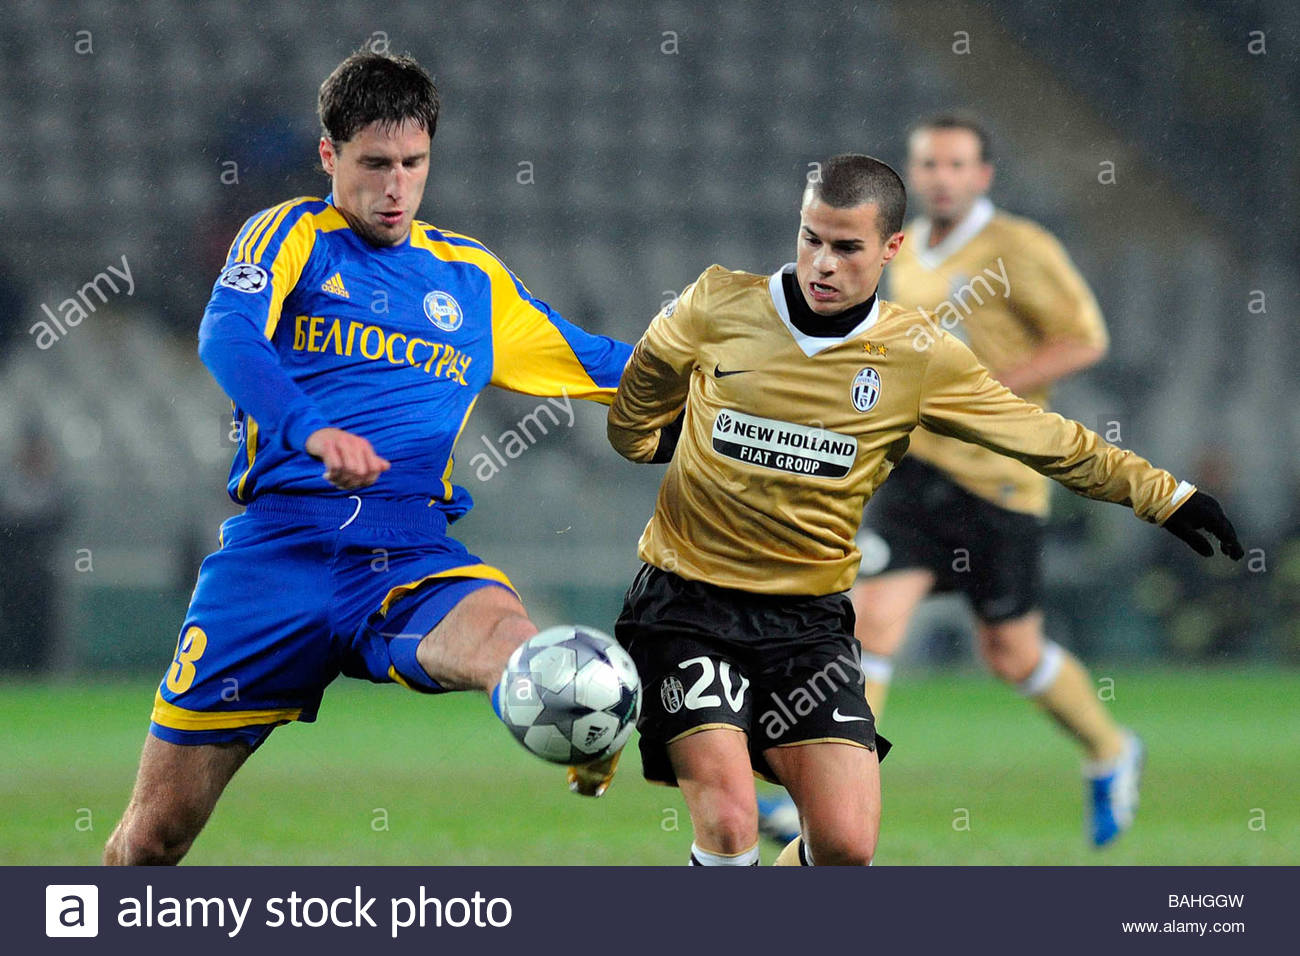 sergei sosnovski and sebastian giovinco'torino 10-12-2008 'football champions league 2008-2009'juventus-bate borisov - Stock Image